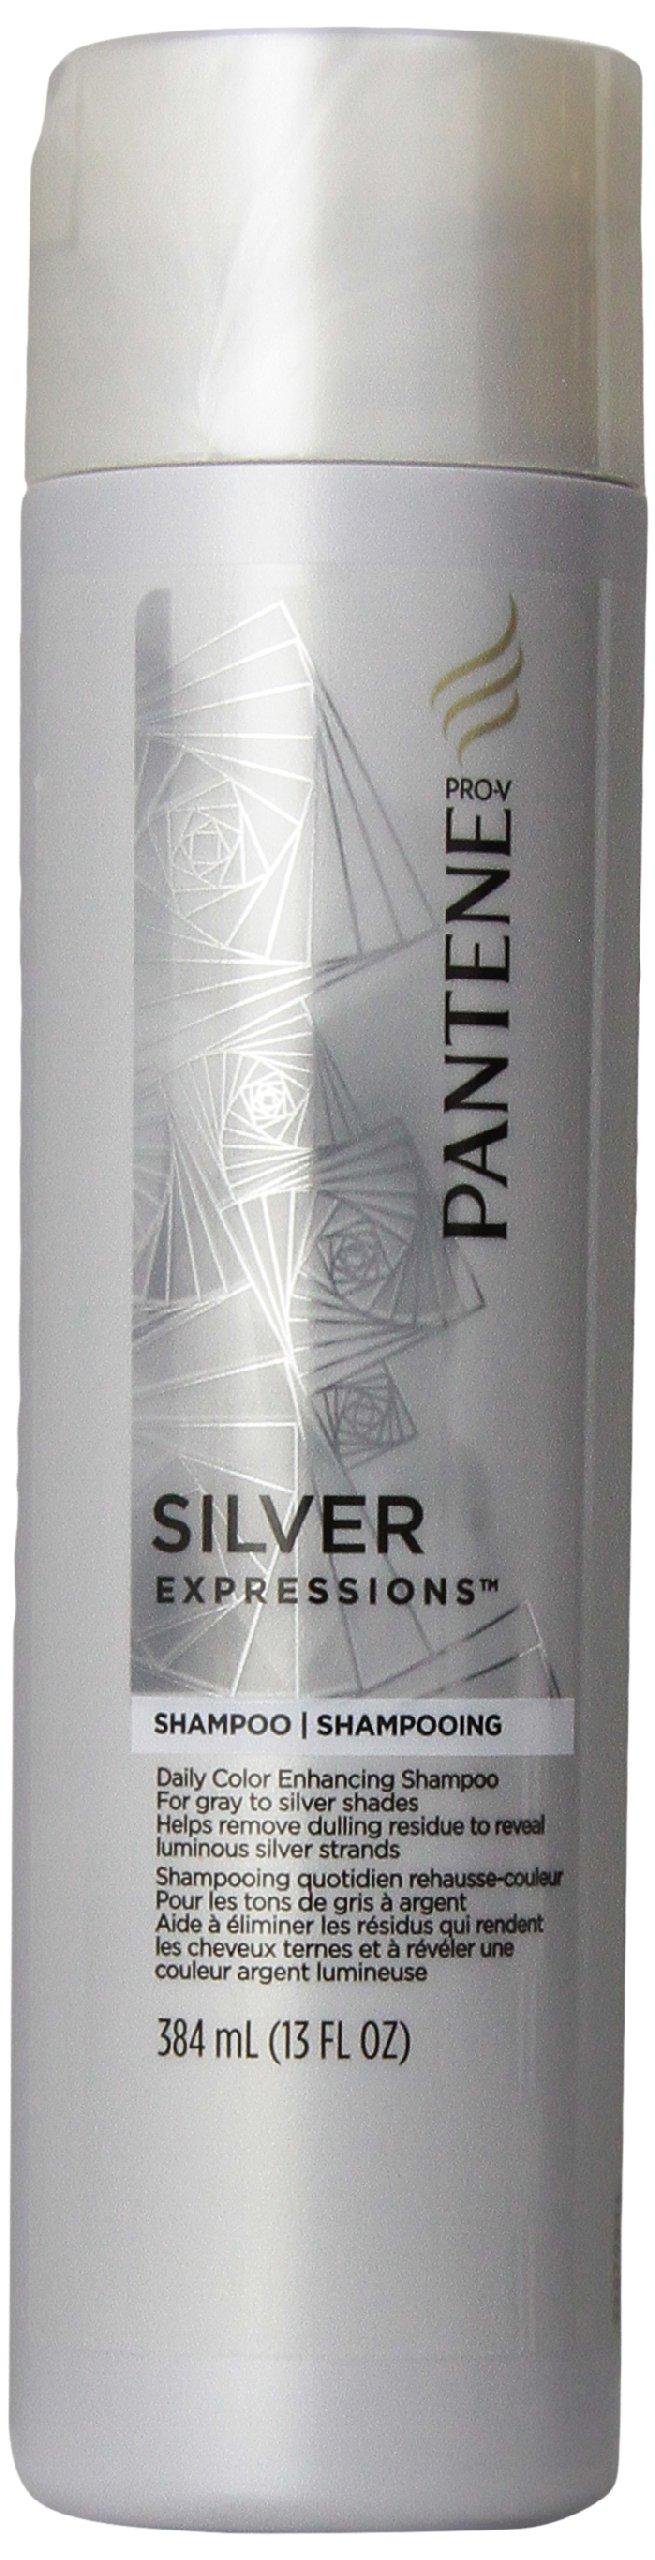 Pantene Pro-V Silver Expressions Shampoo 13 oz by Pantene